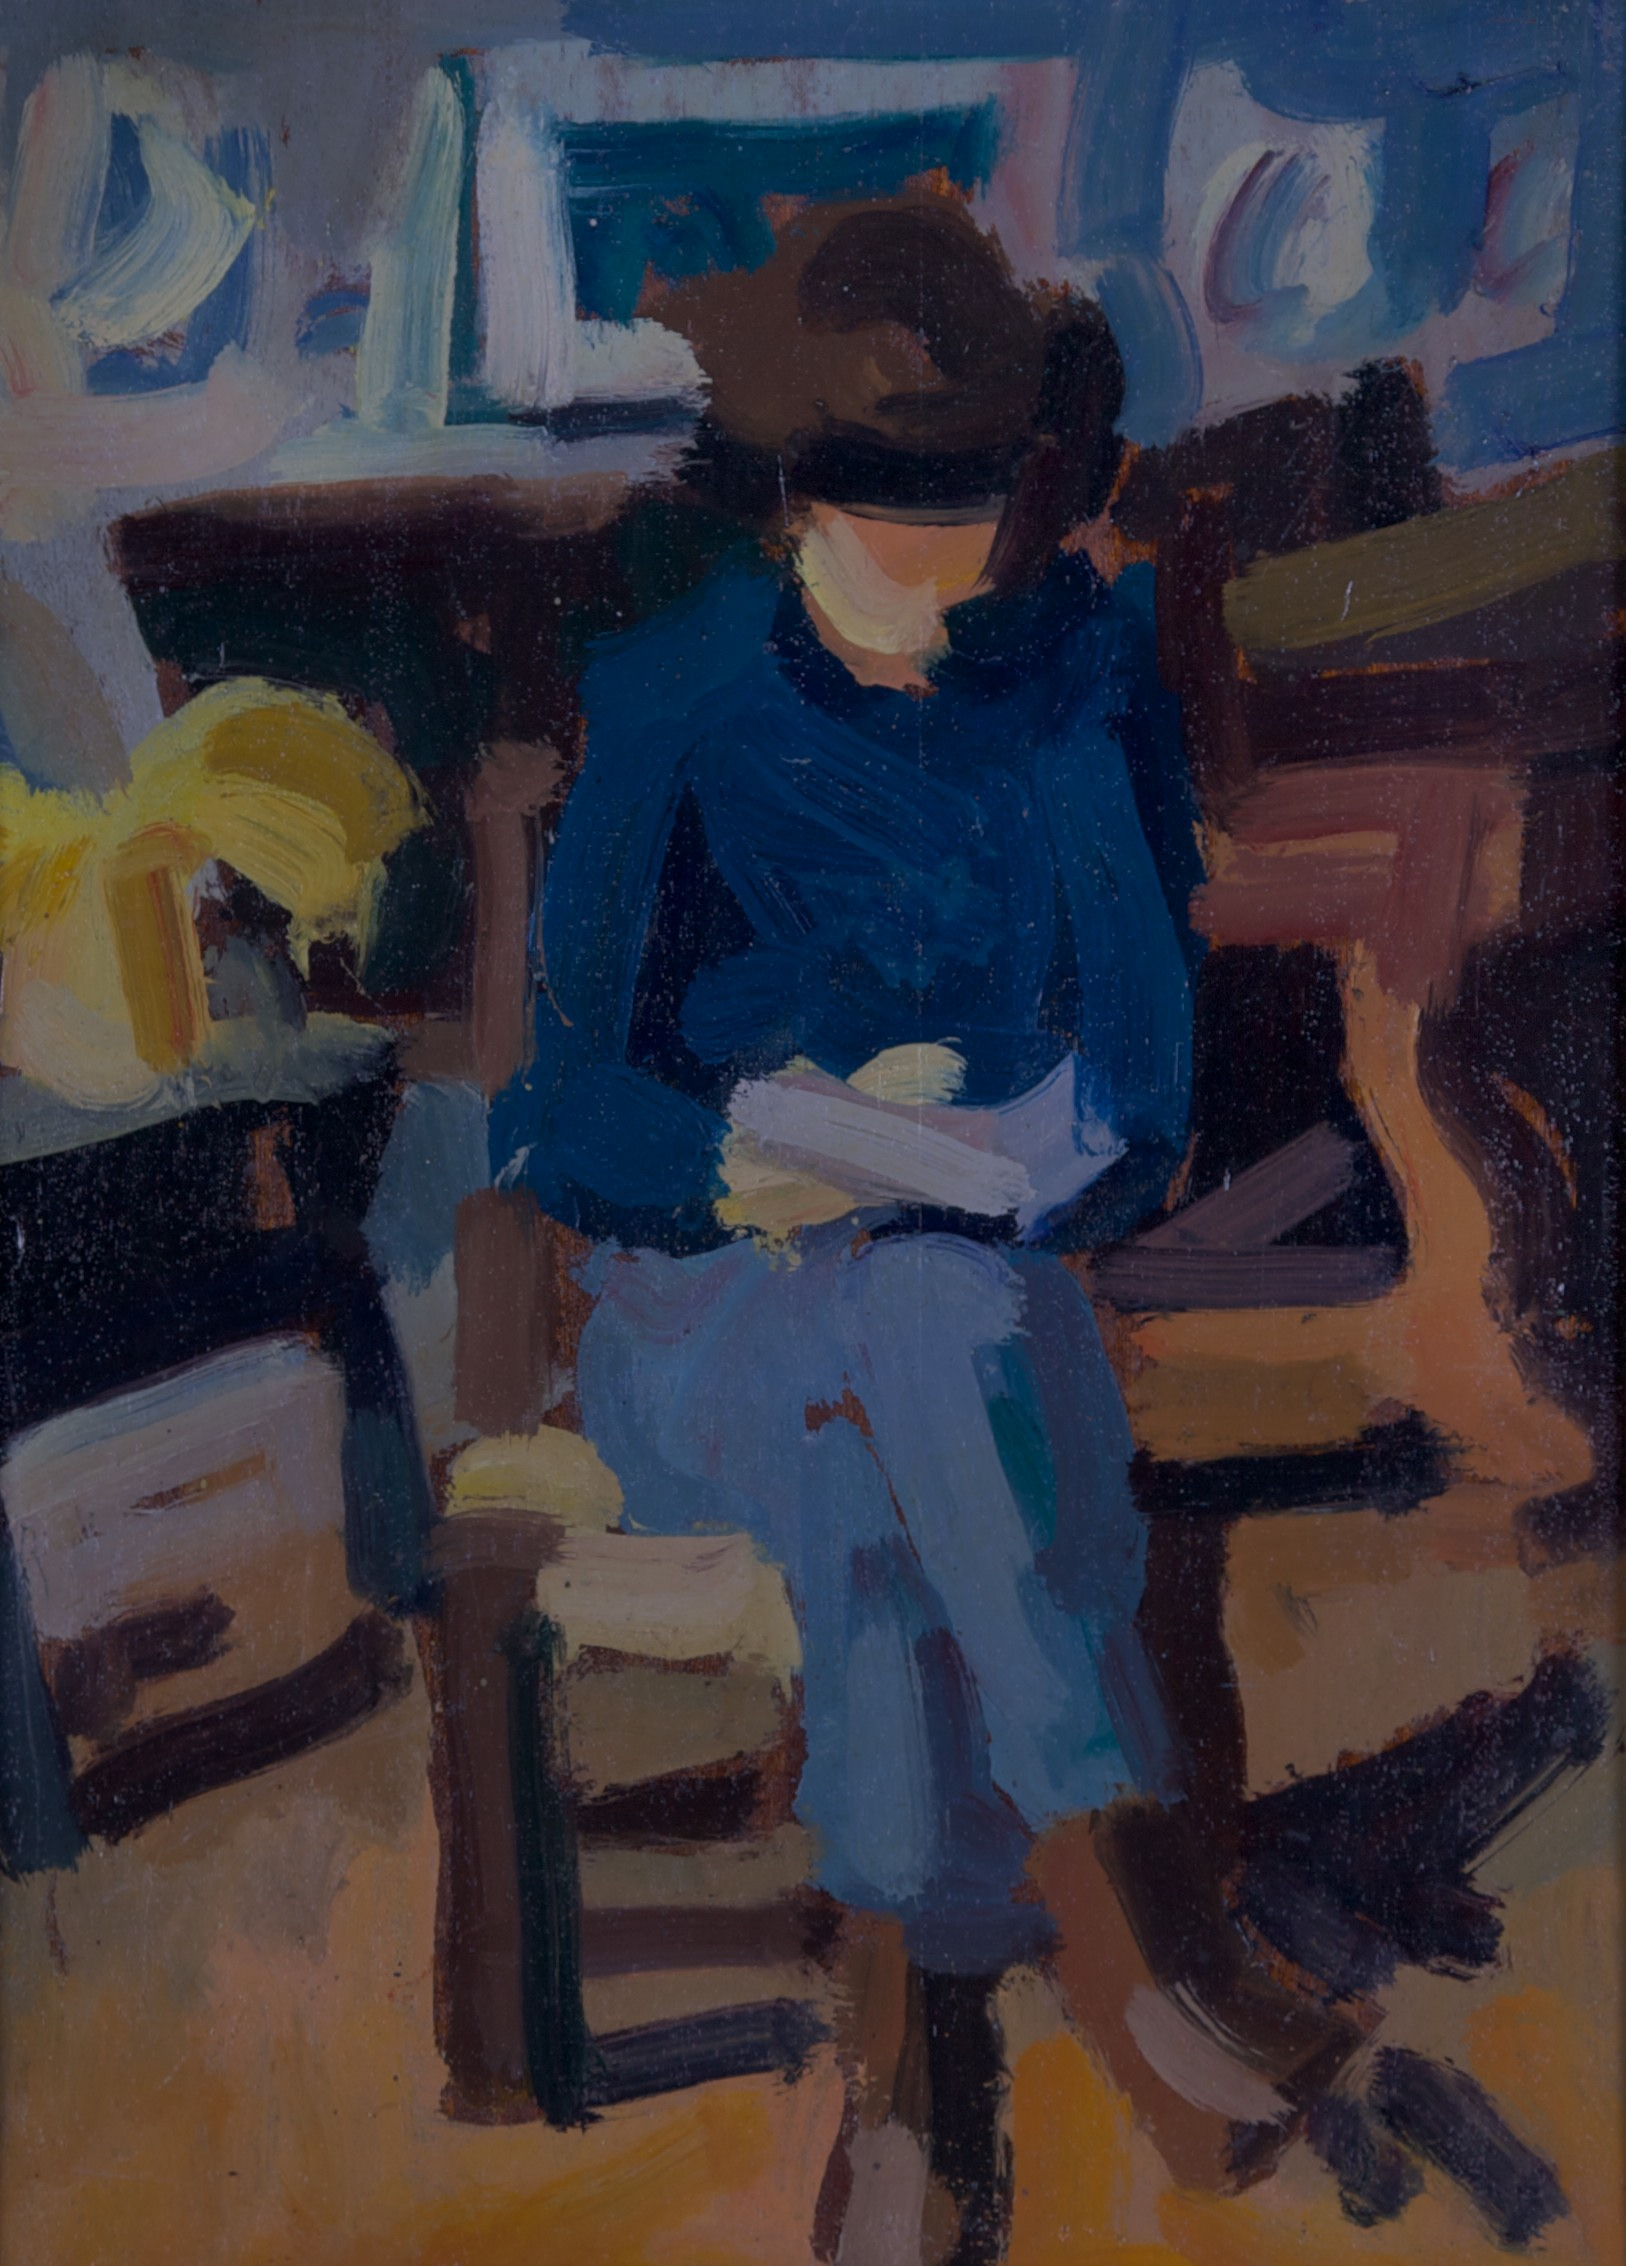 Helene che sta leggendo